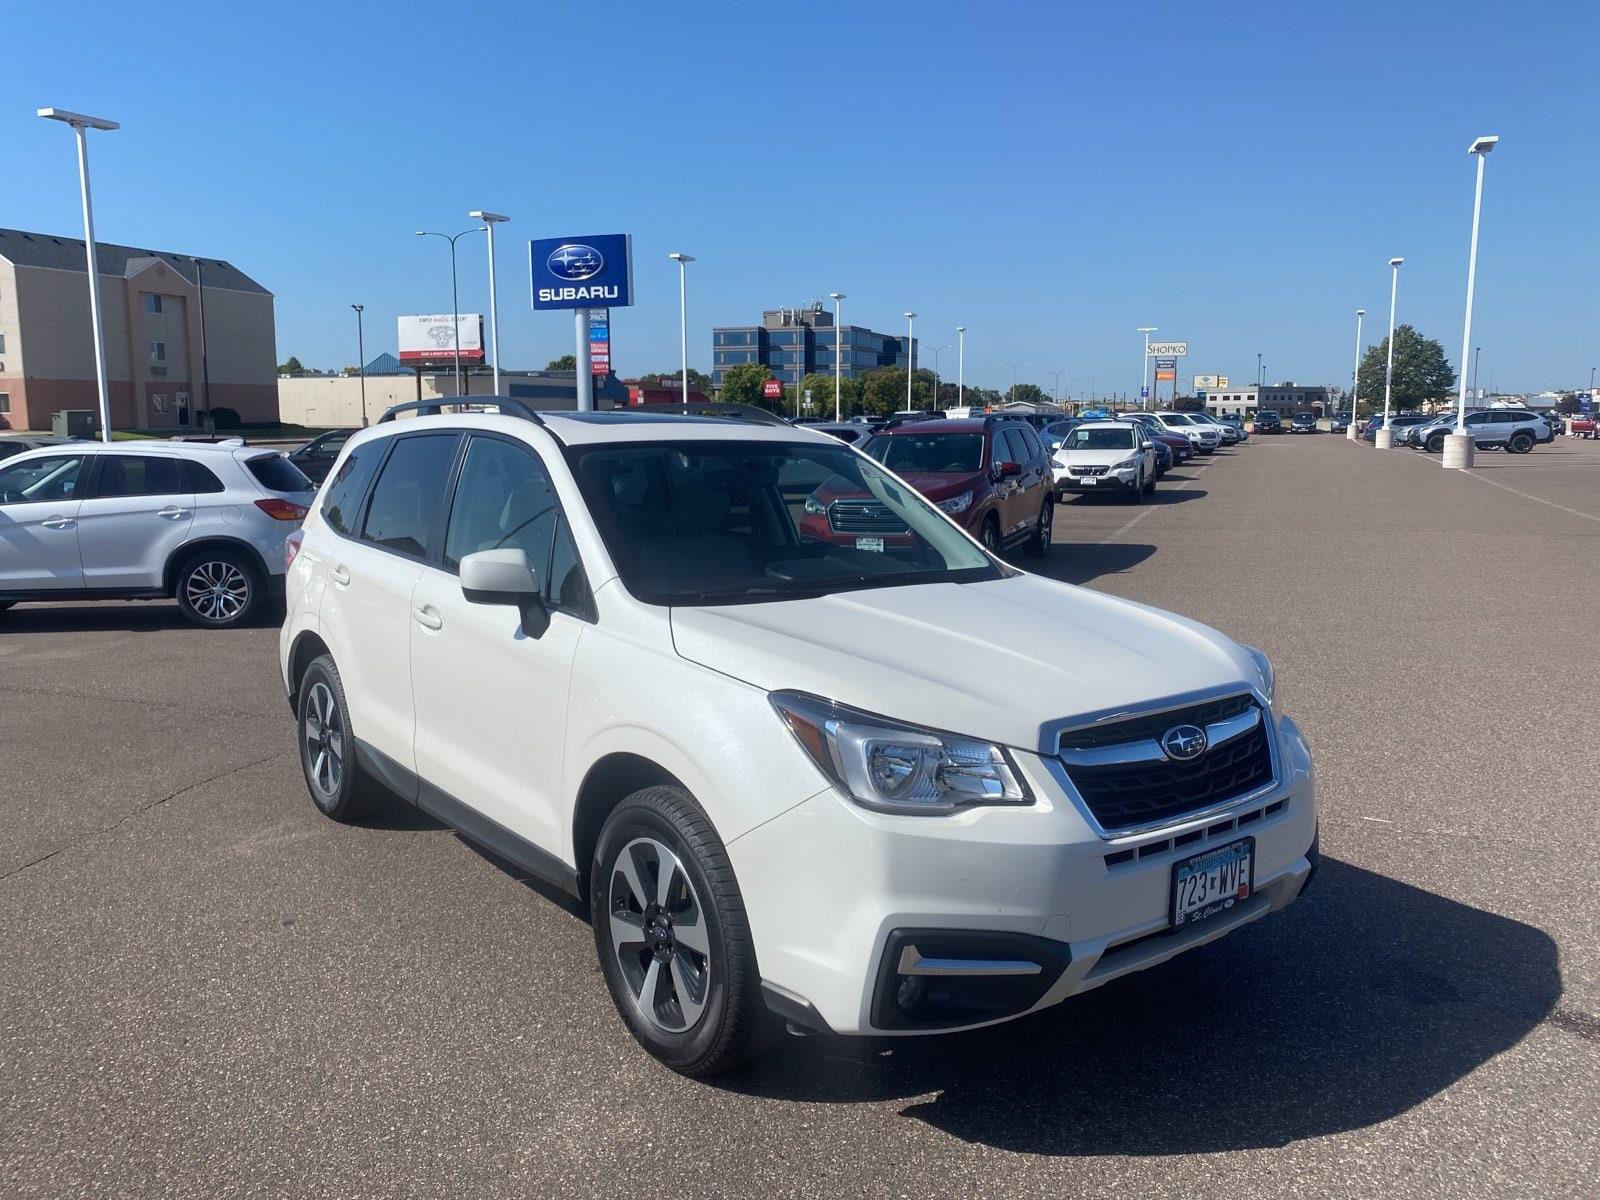 Used 2018 Subaru Forester Premium with VIN JF2SJAGCXJH414242 for sale in Saint Cloud, Minnesota